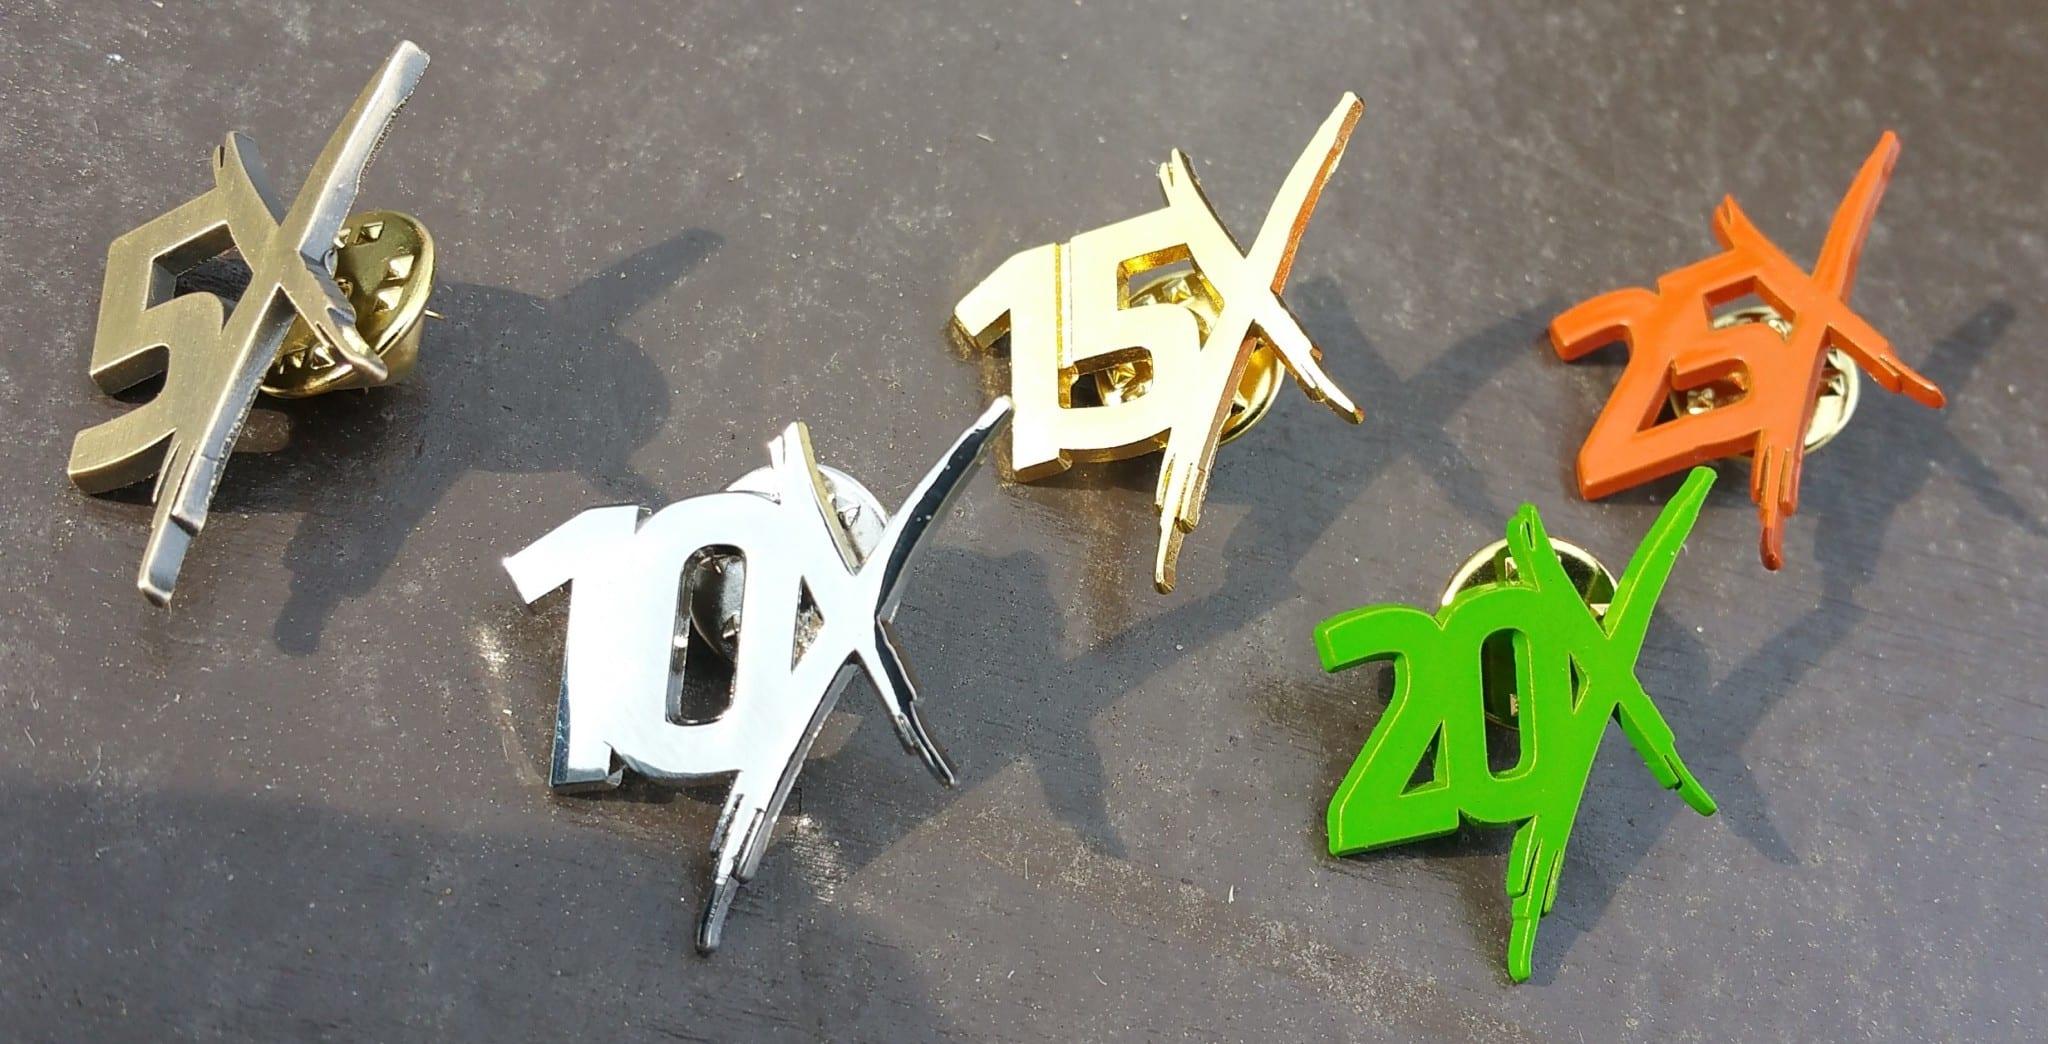 BattleFrog 24hr Xtreme - Lap Pins